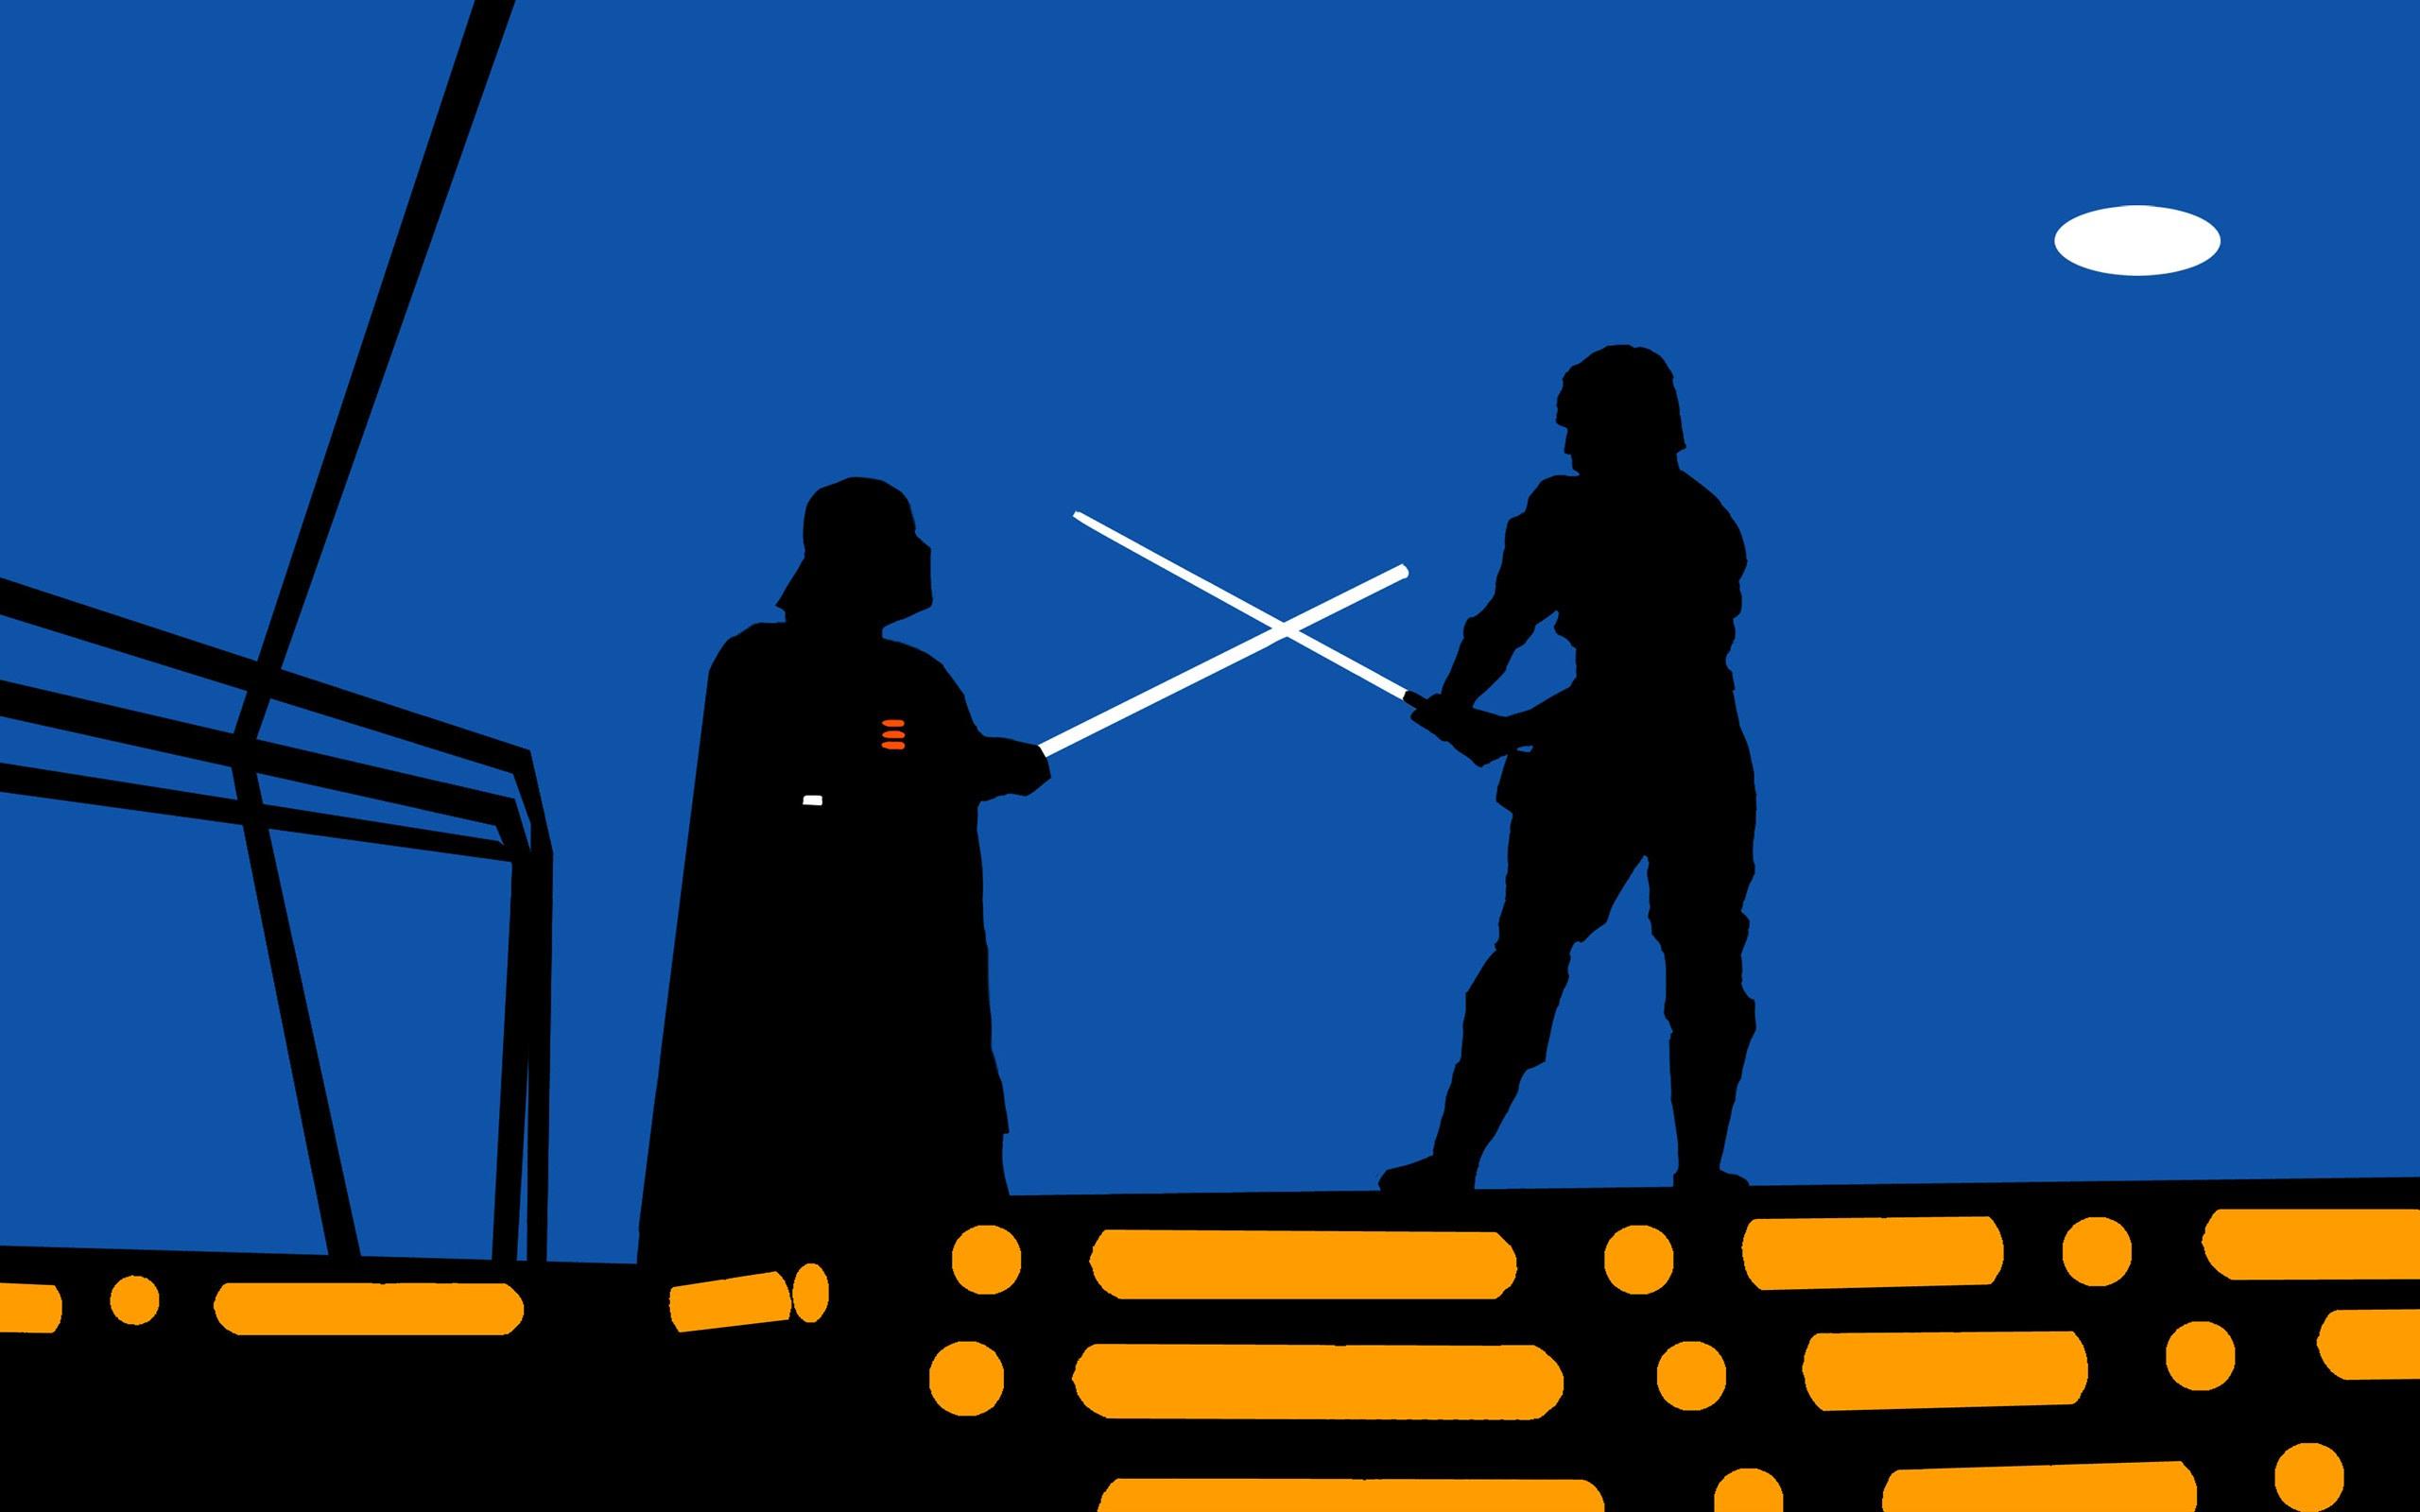 Star Wars Minimalism Darth Vader Luke Skywalker Fighting